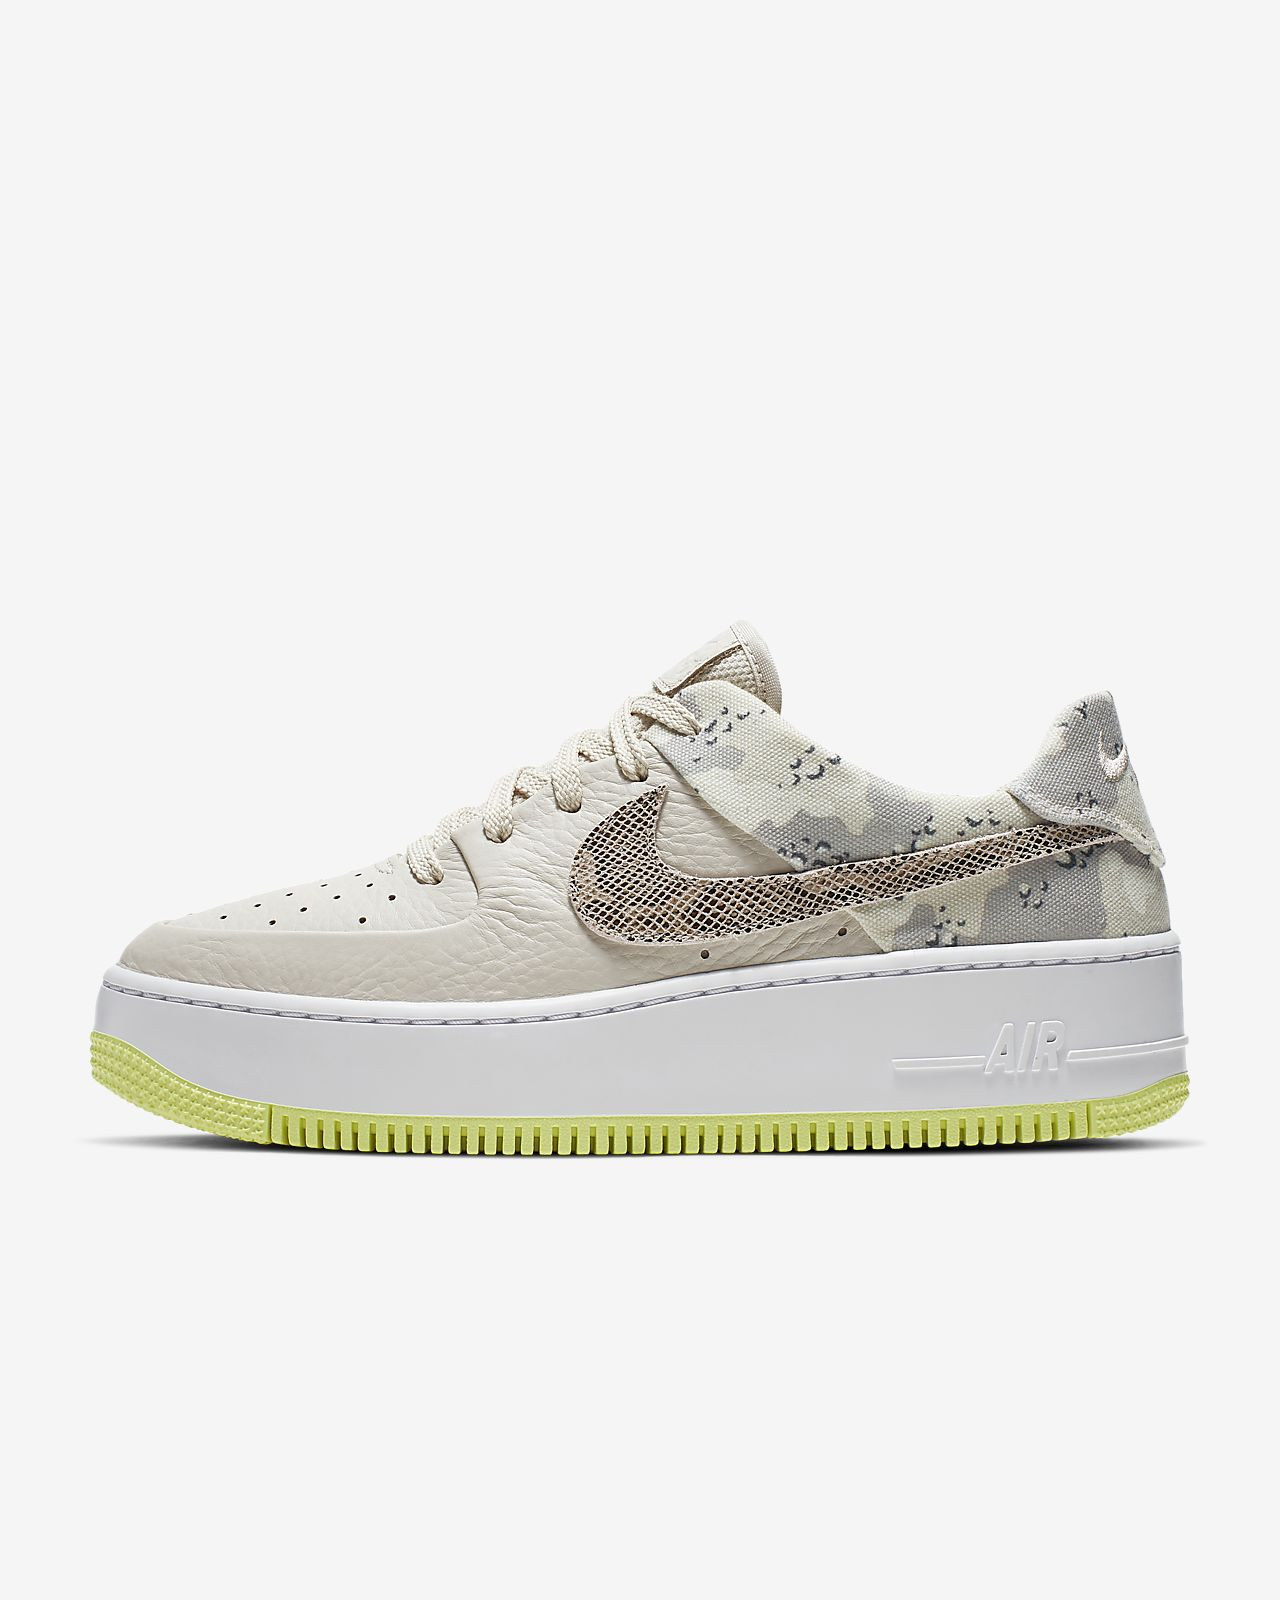 Nike Air Force 1 Sage Low Premium Camo Damesschoen